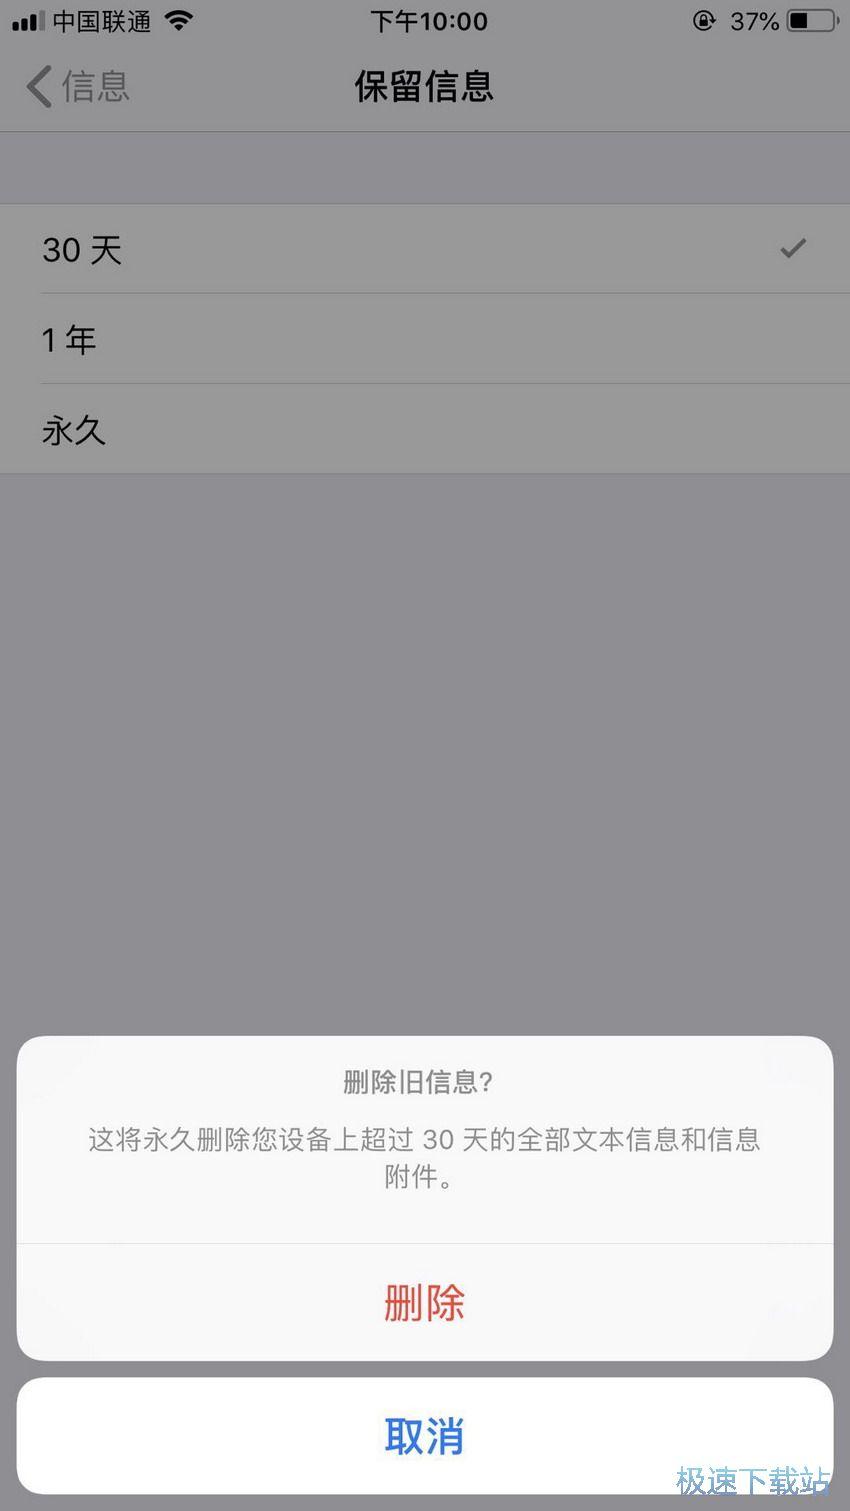 iPhone手机如何批量删除垃圾骚扰短信? 缩略图